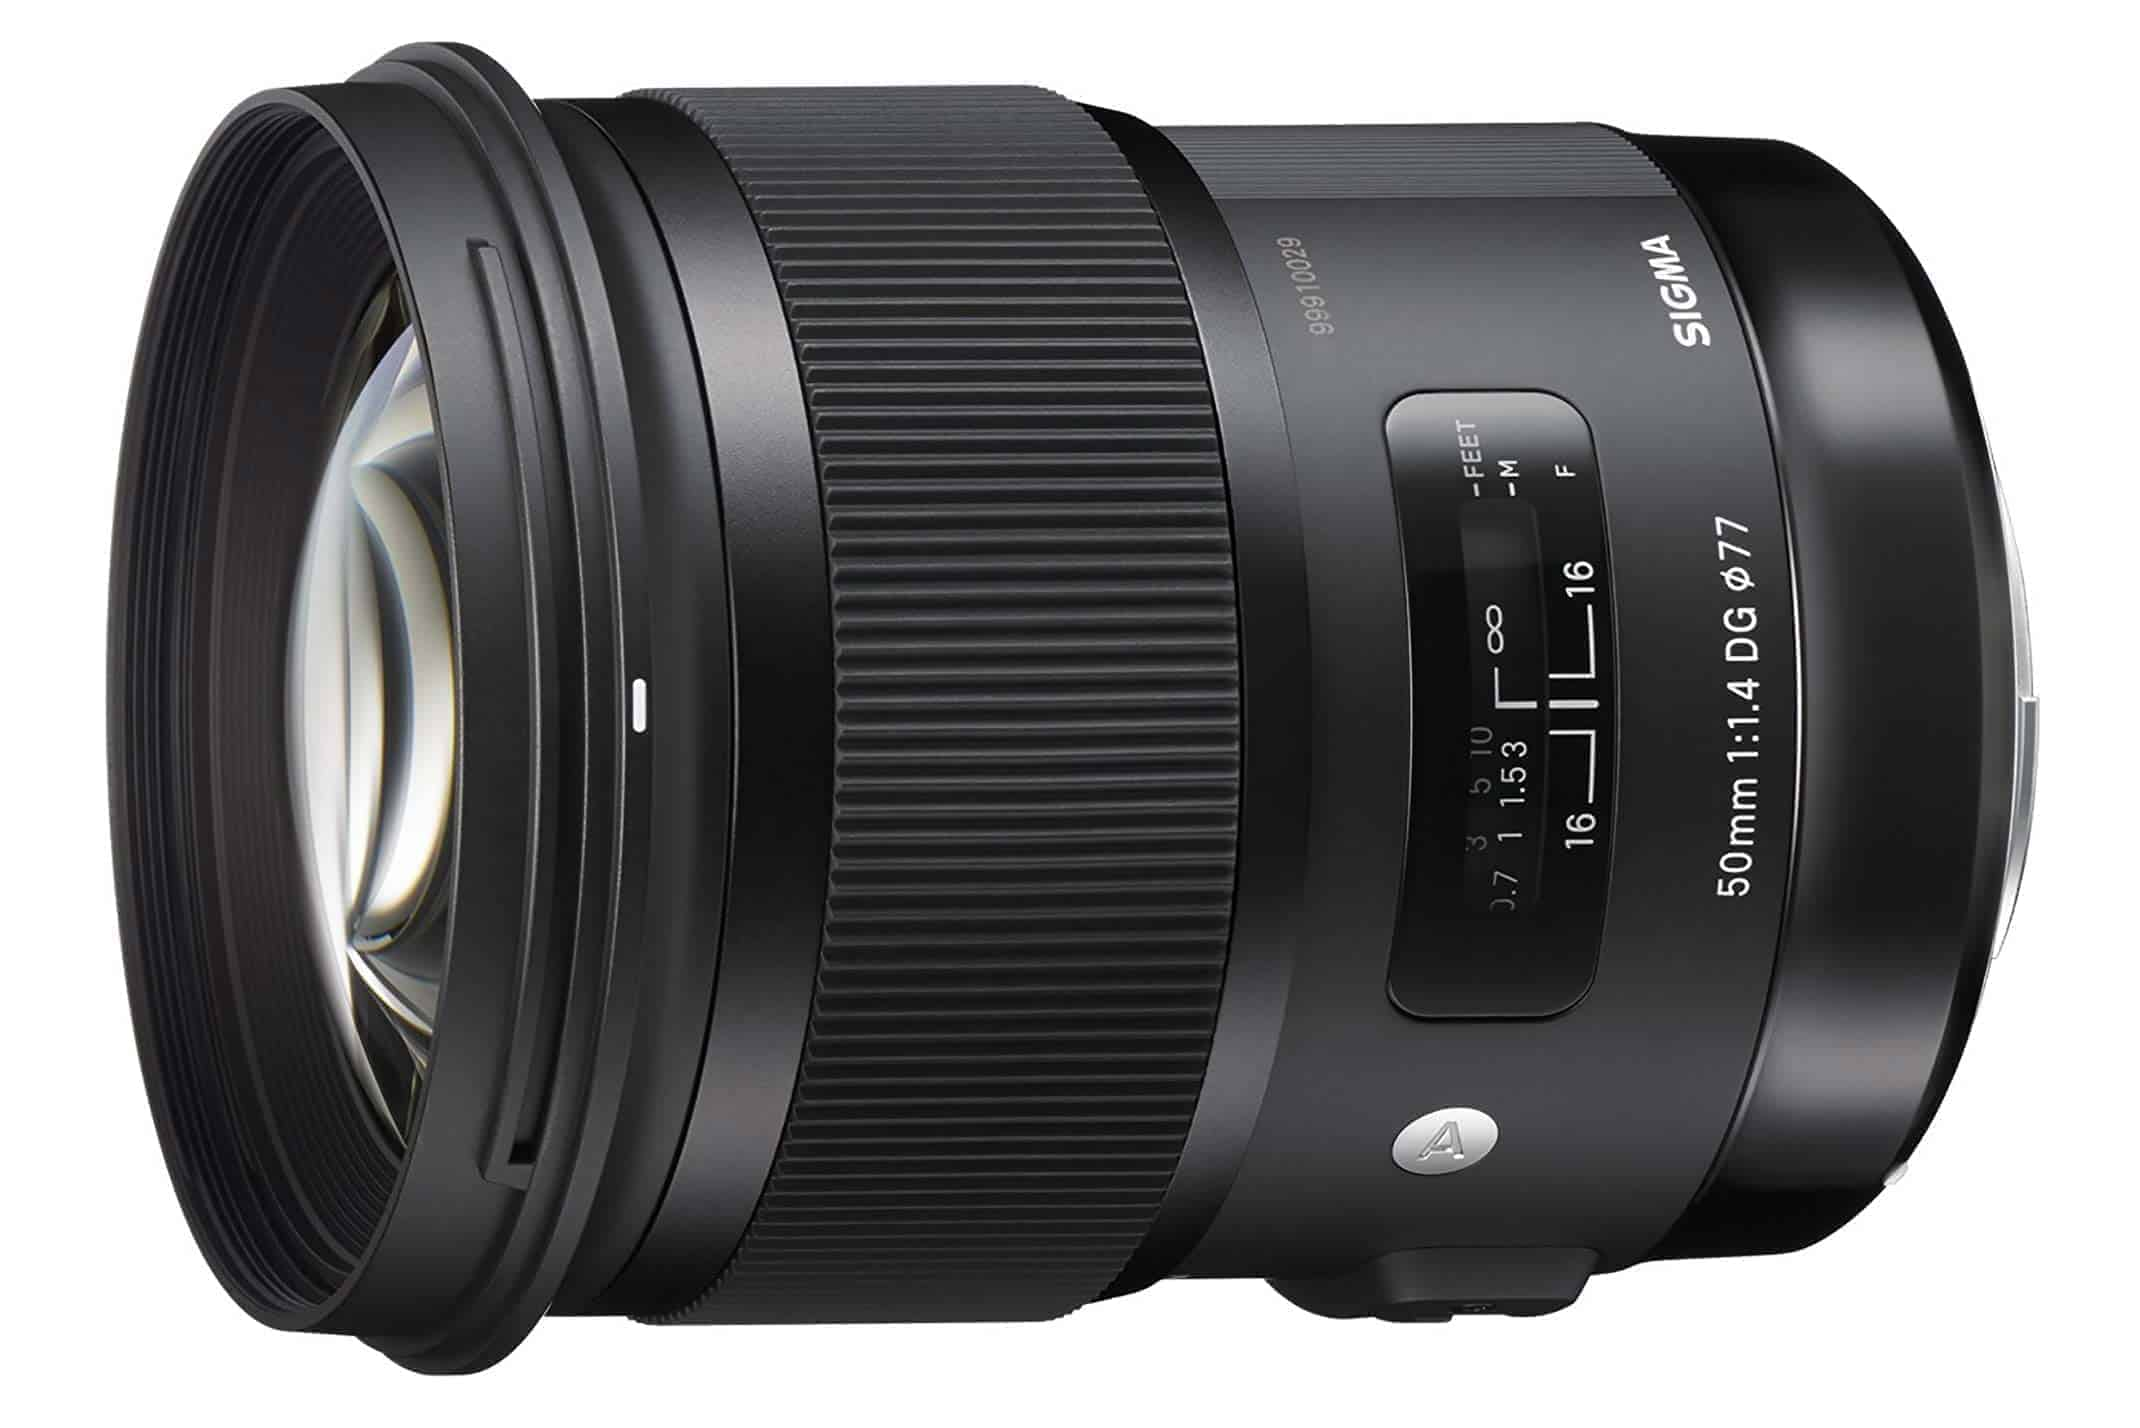 Sigma 50mm f/1.4 lens